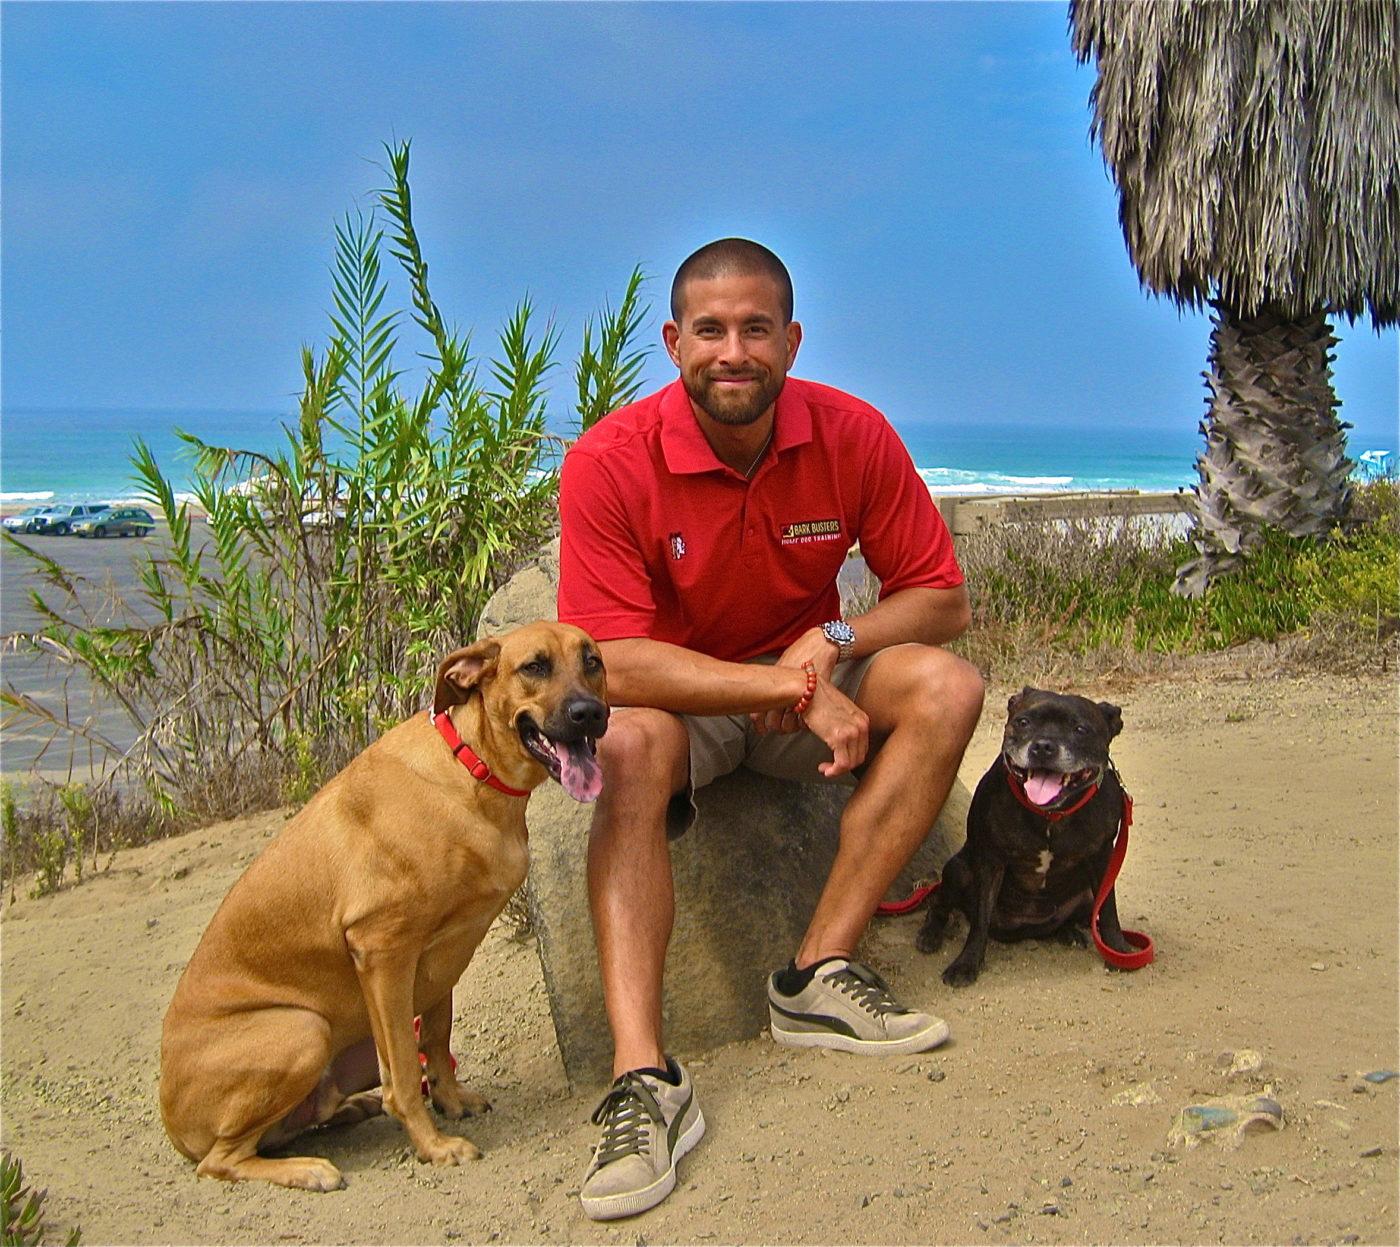 #mydogs, #justinscher, #barkbustershomedogtrainingsandiego, #pitbulllove